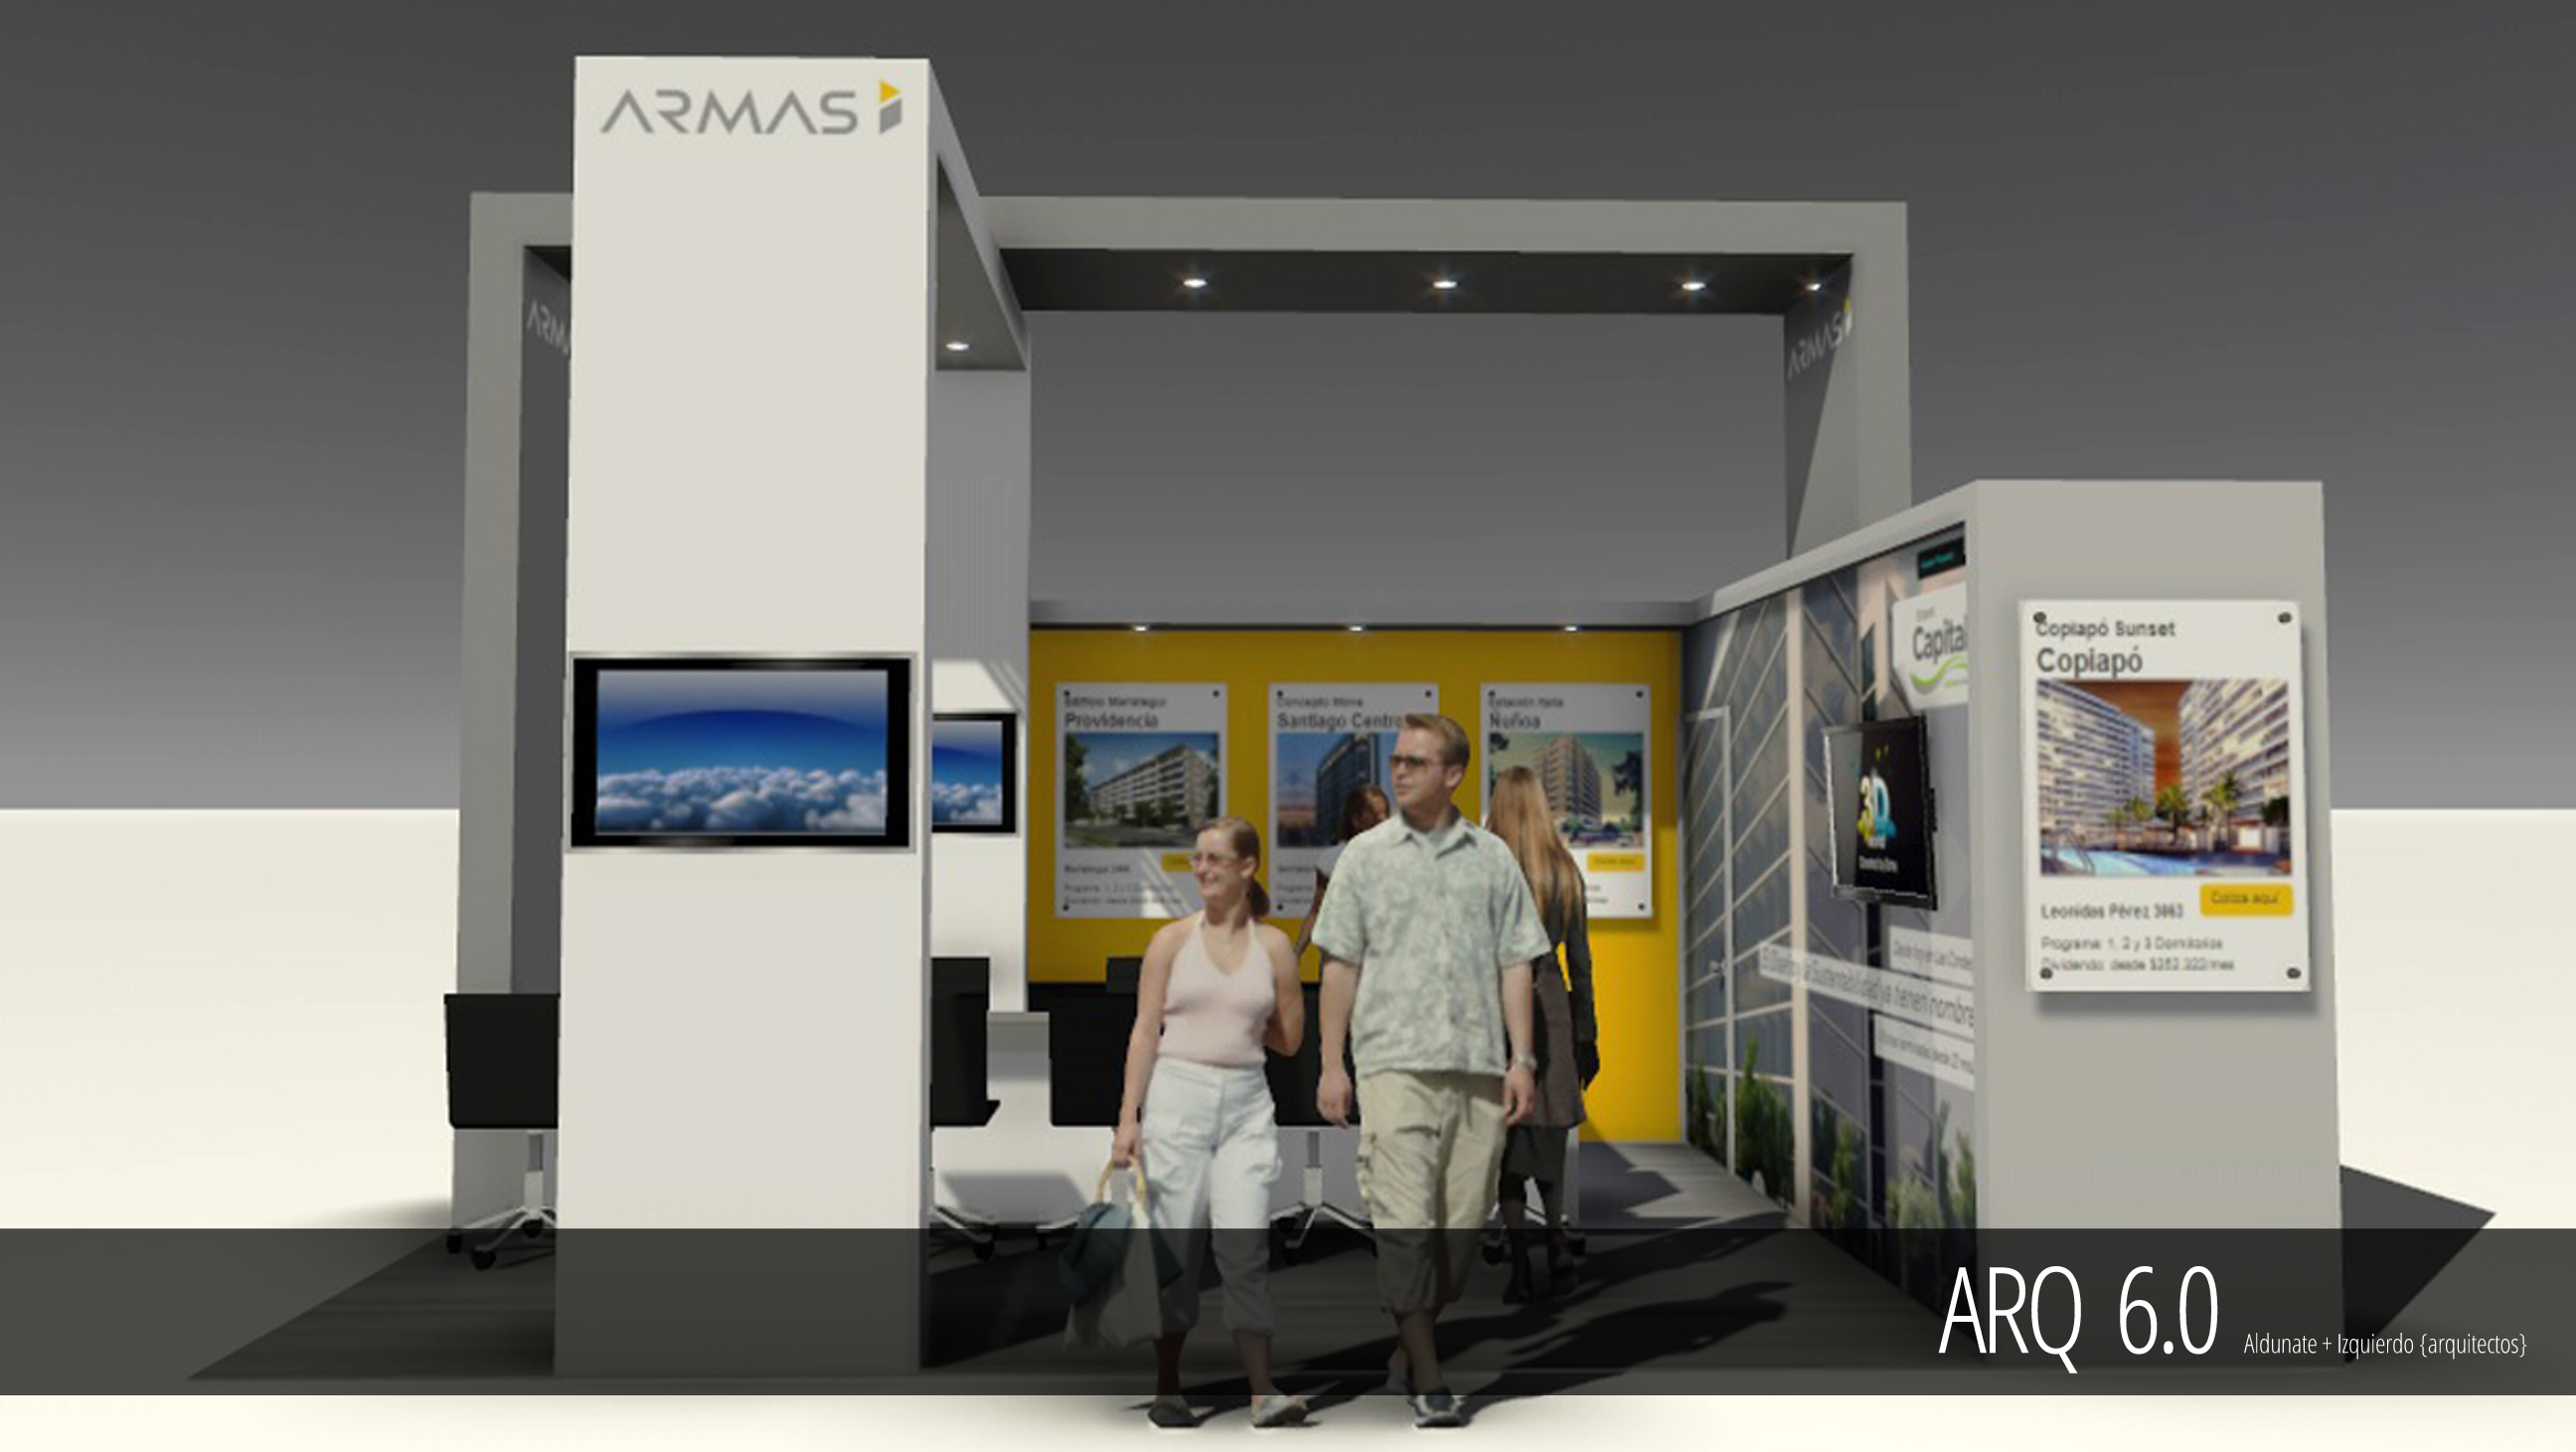 ARQ 6 - Armas Expovivienda - 03.jpg